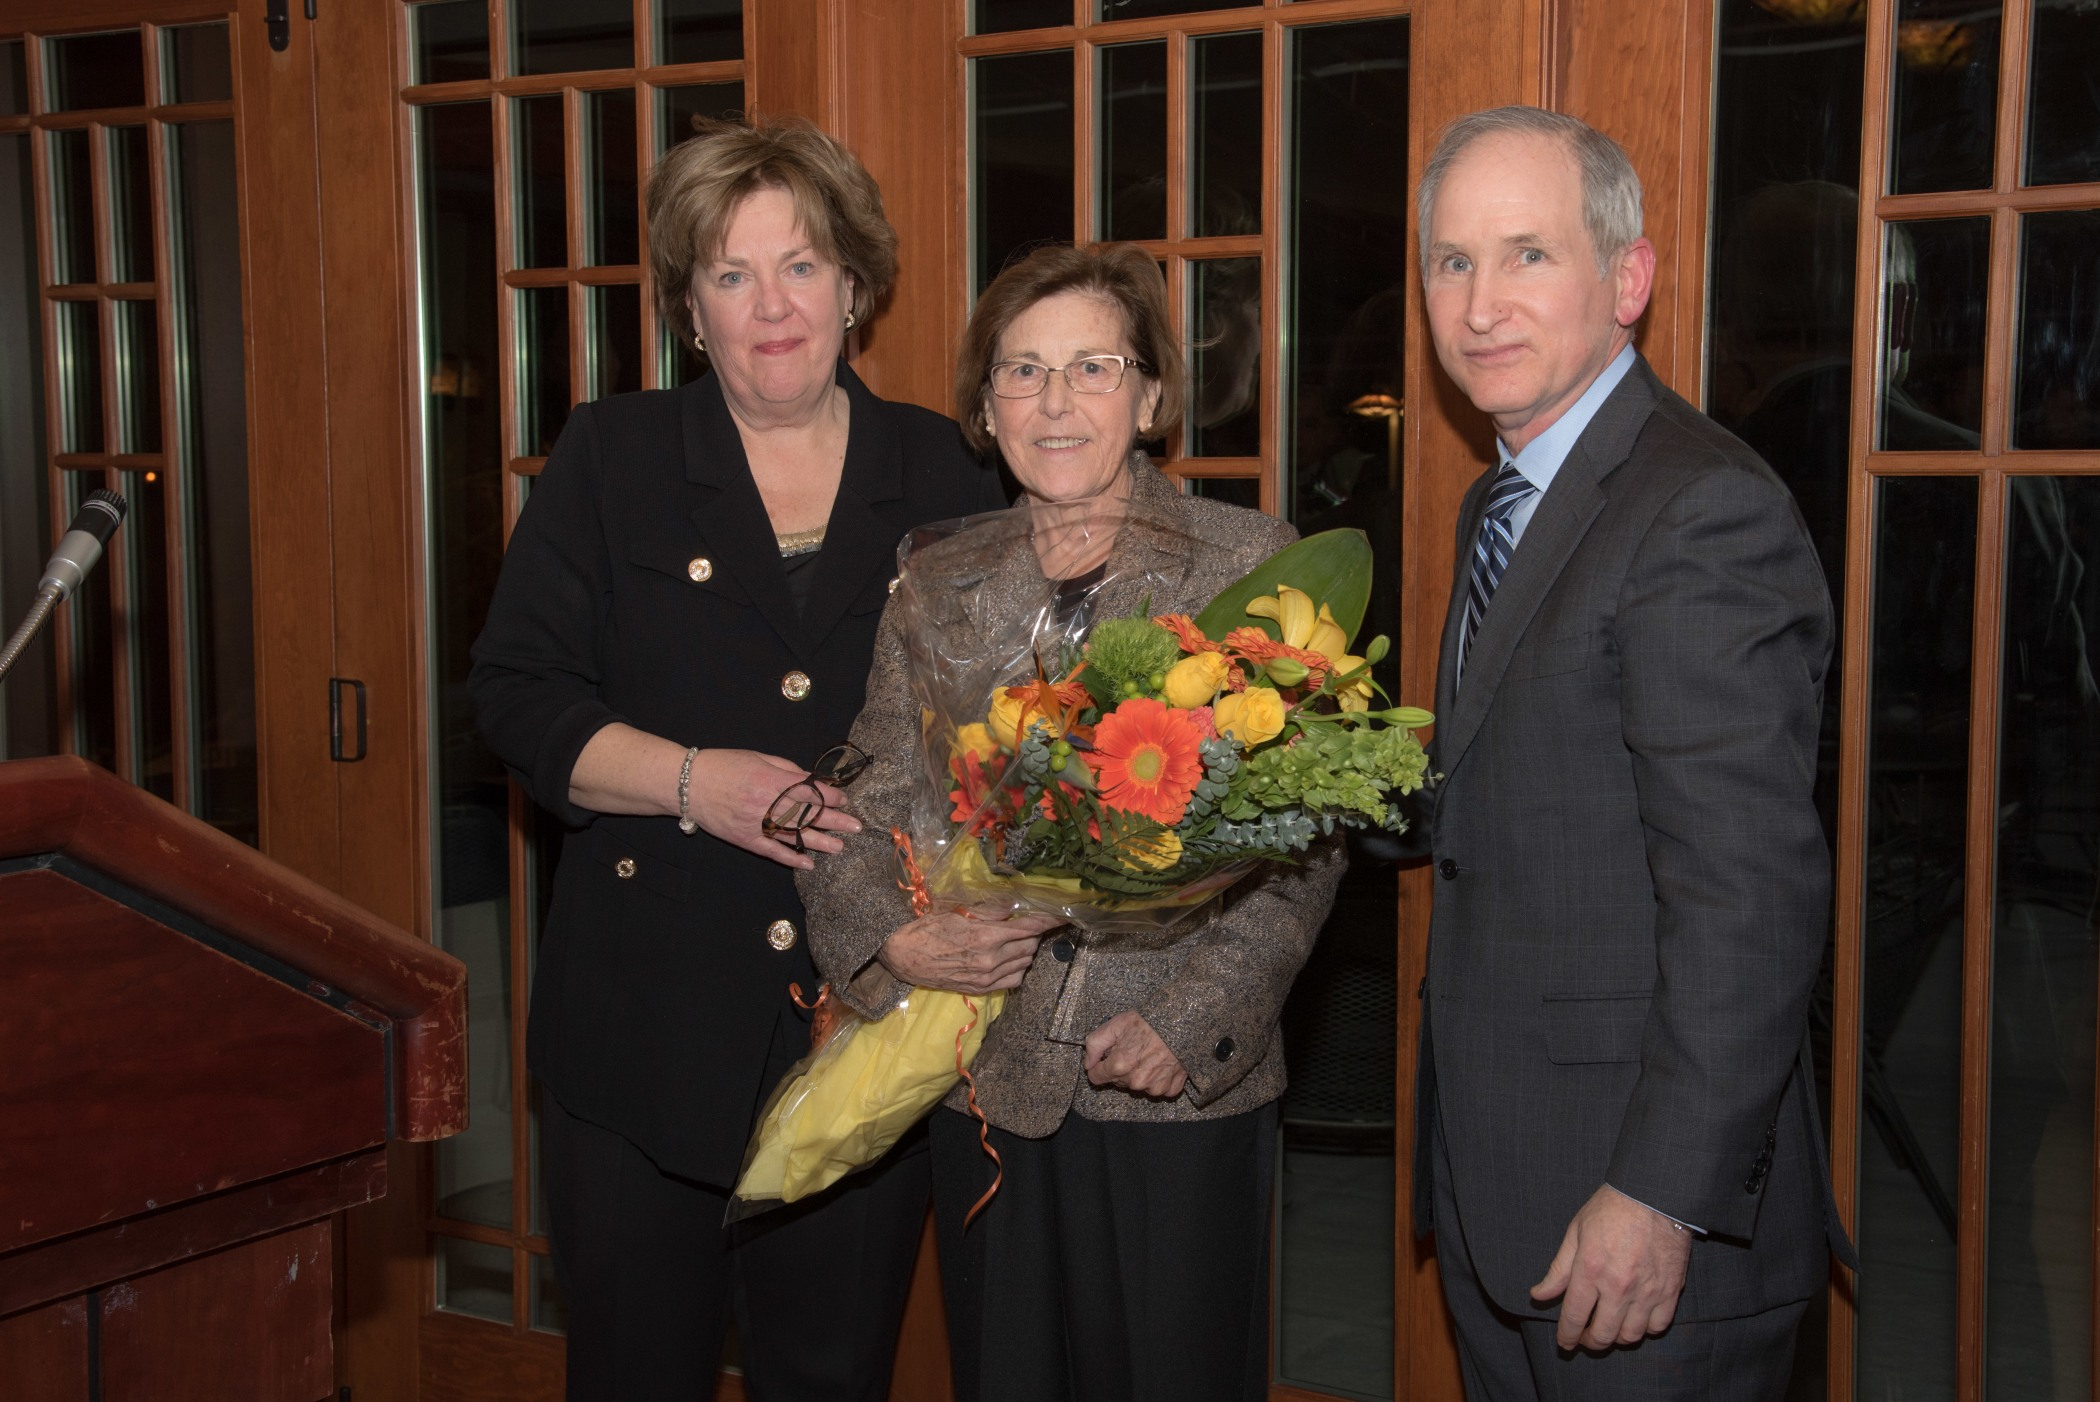 Cathy Lyons, Ruth McCorkle, Charles Fuchs